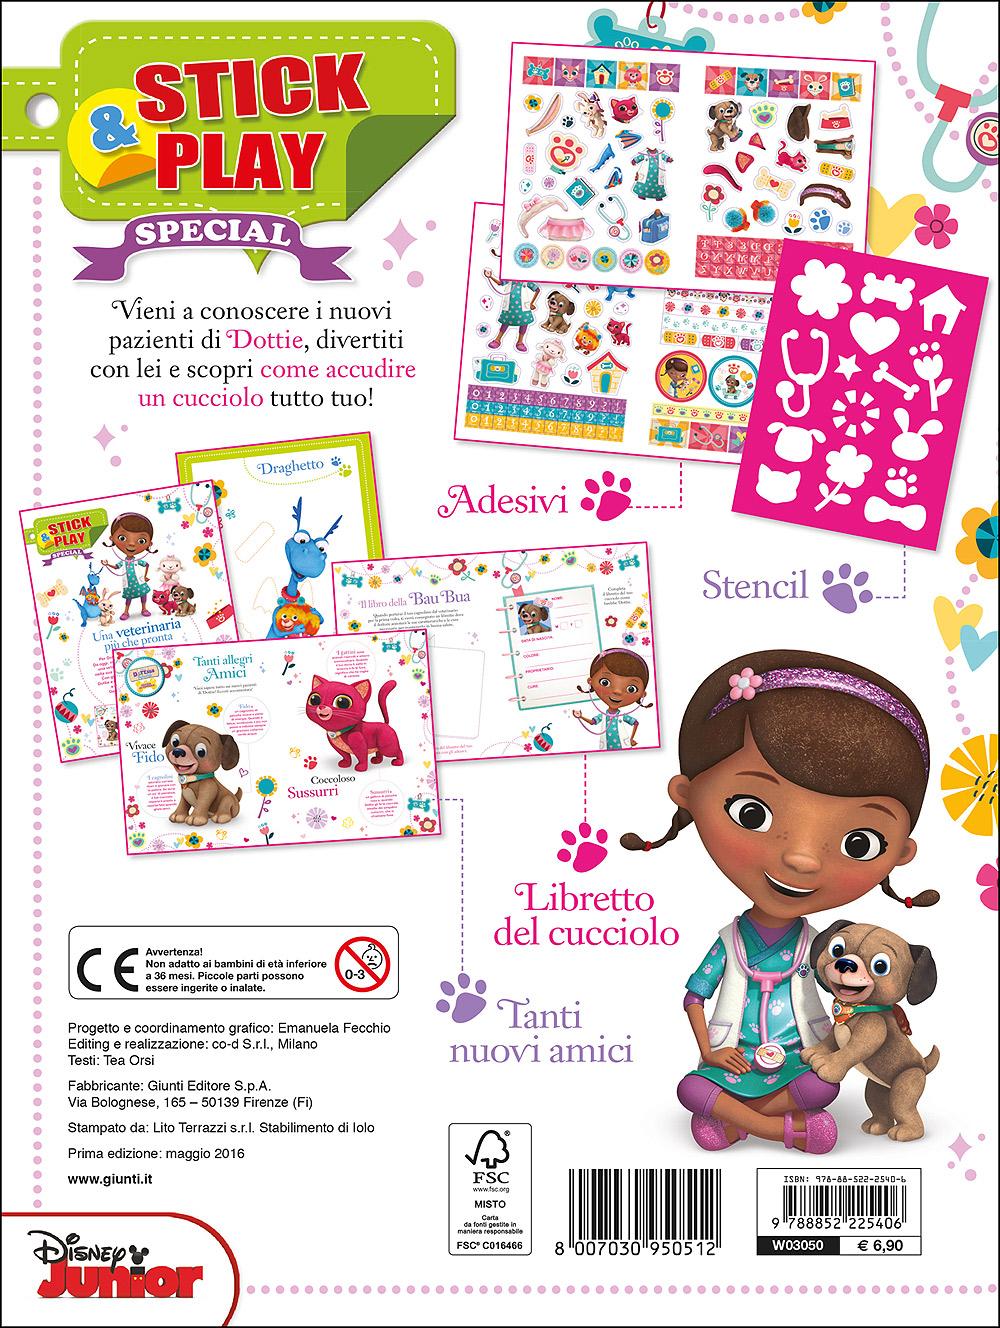 Stick&Play Special - Dott.ssa Peluche. Piccola veterinaria